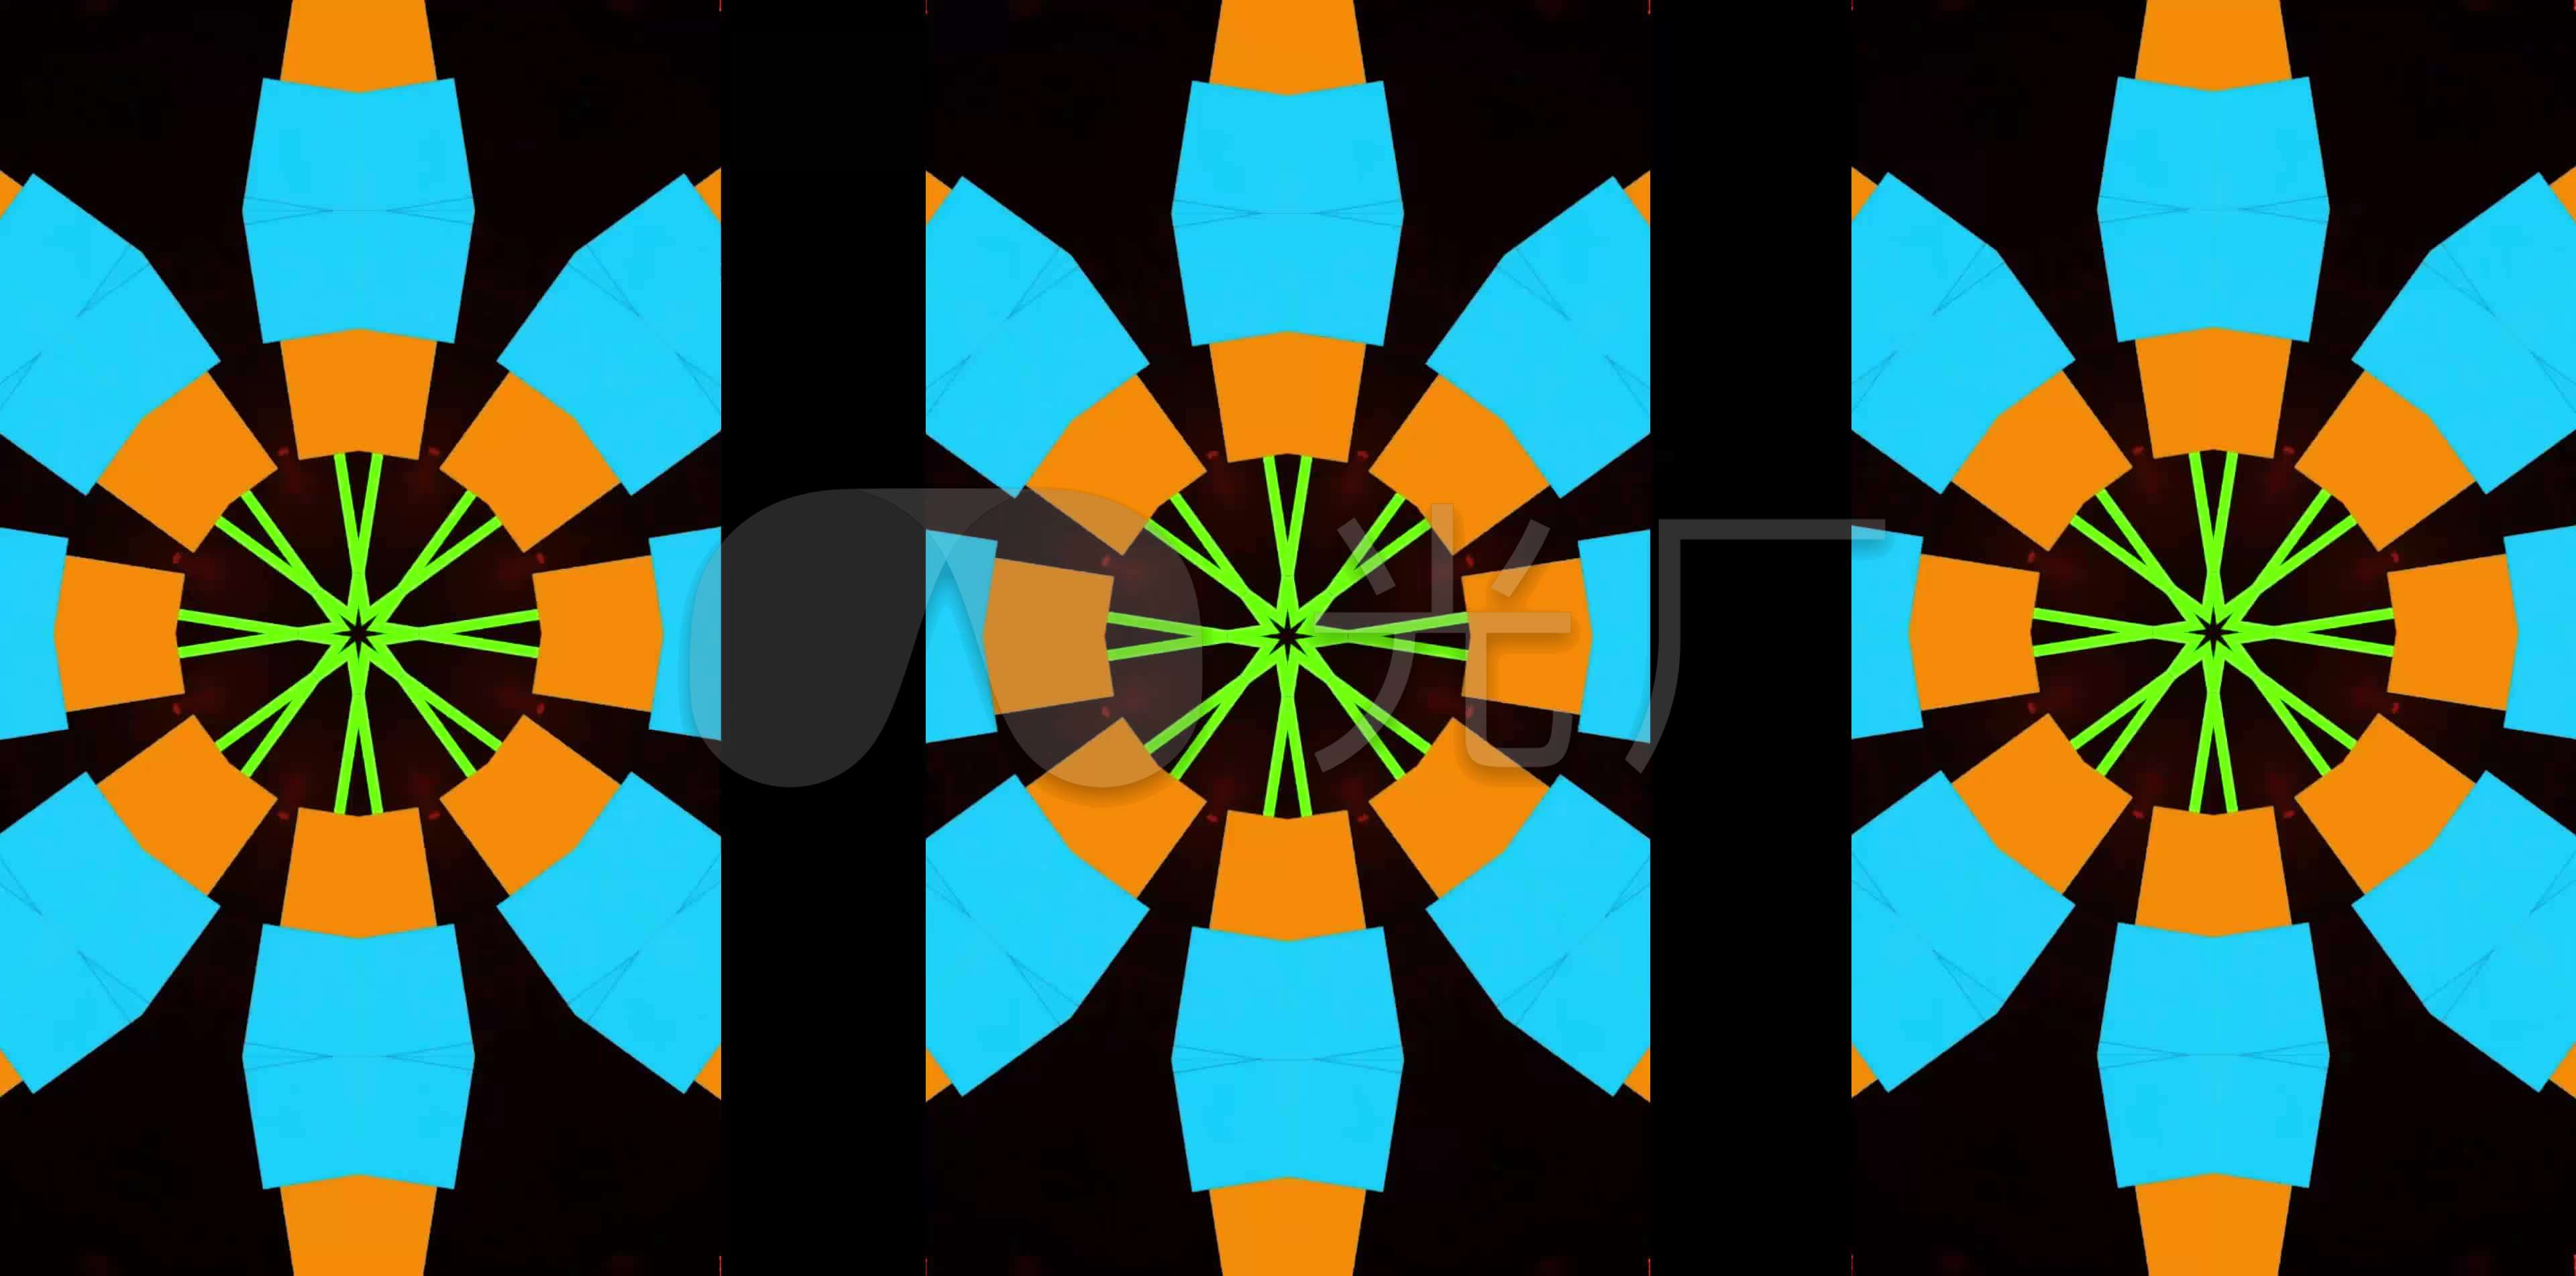 4k街舞现代舞爵士舞涂鸦色彩彩色几何背景